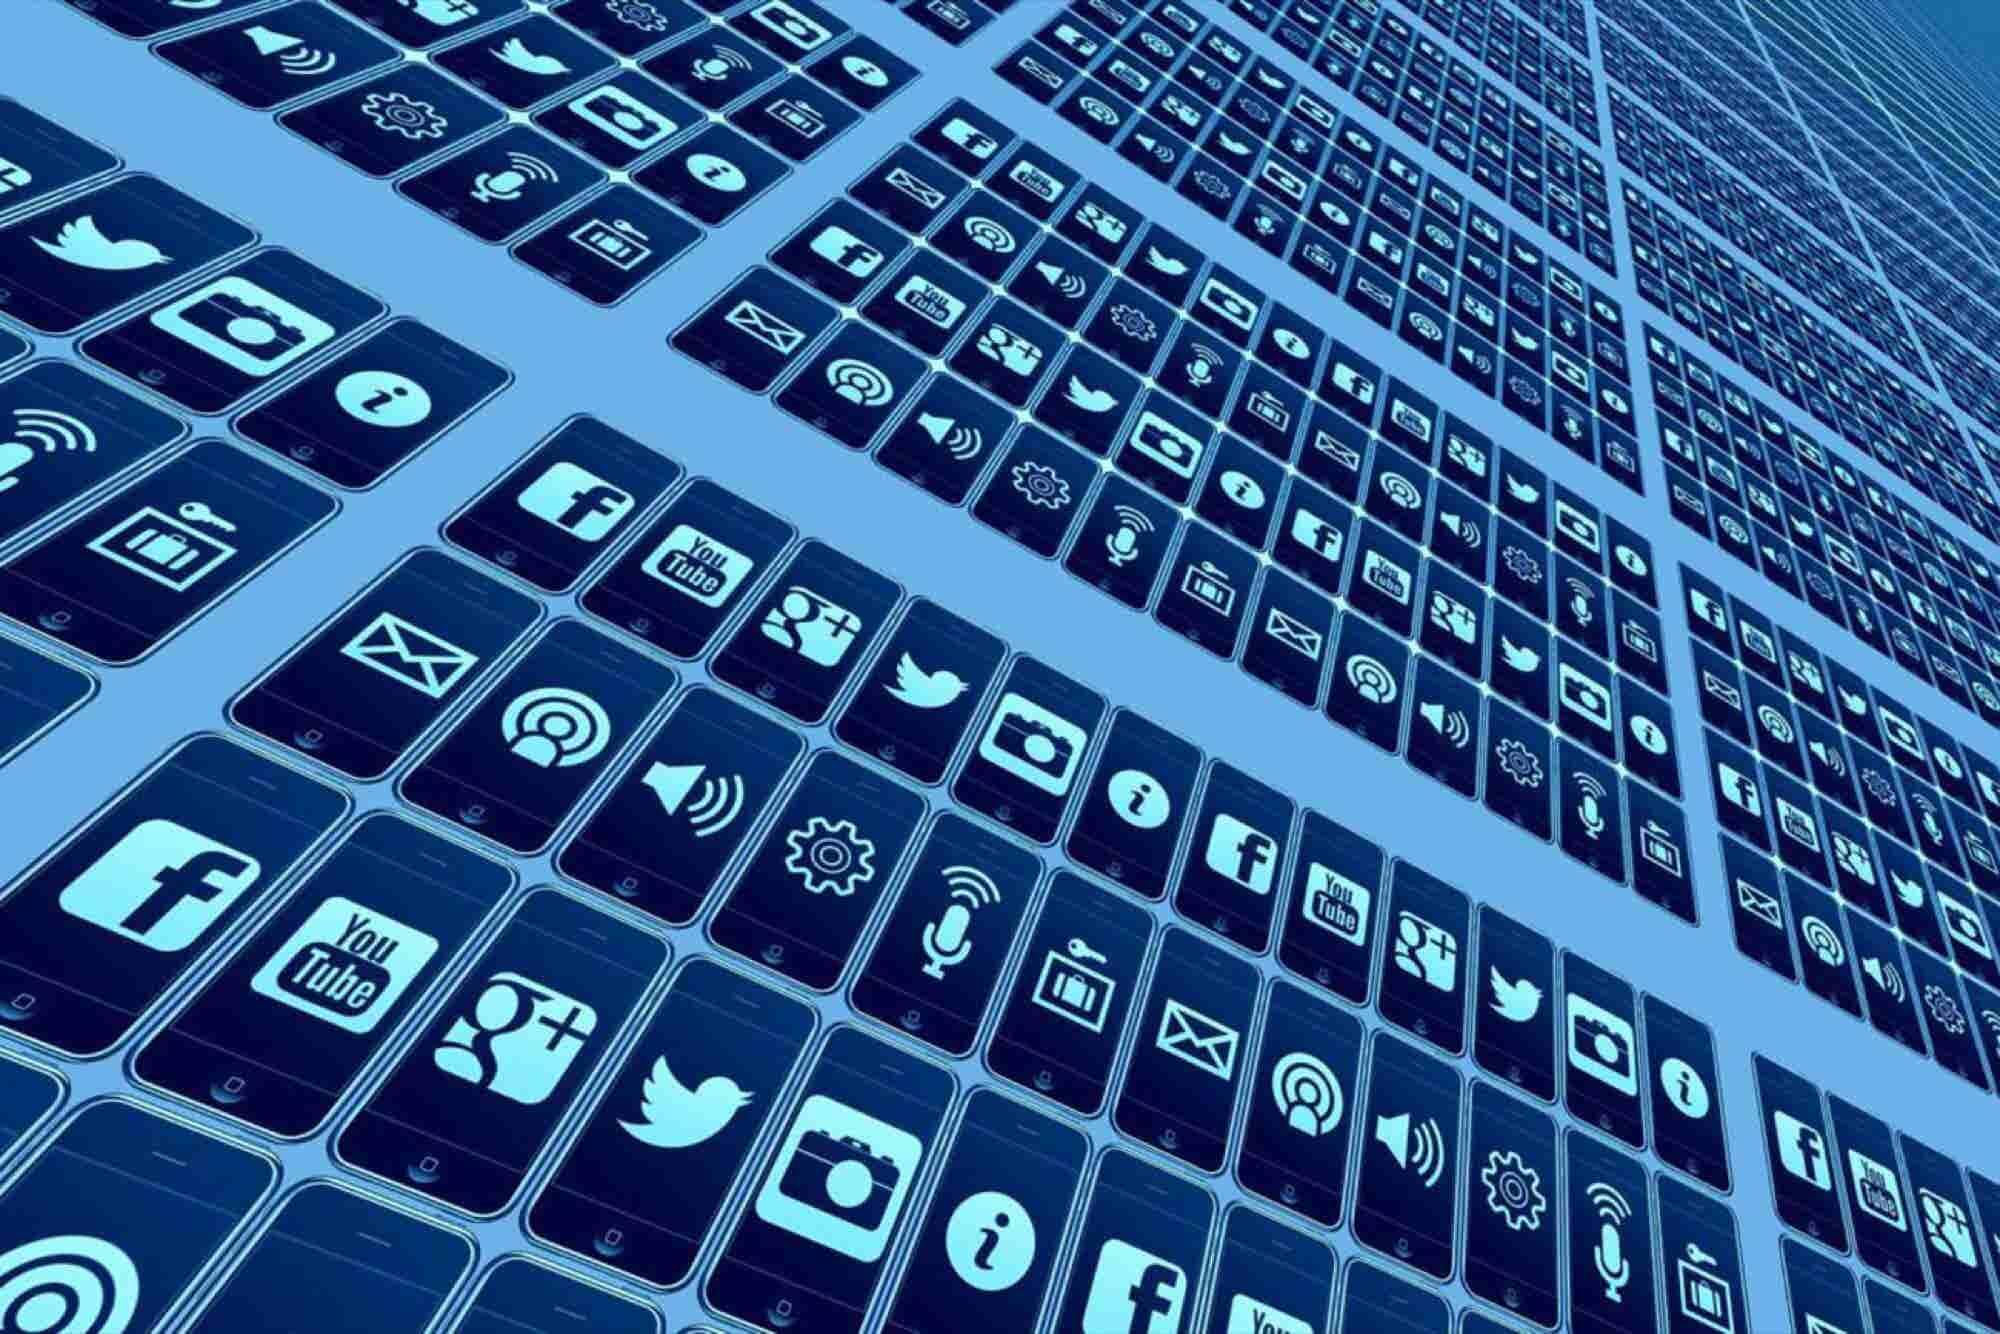 7 Basic Social-Media Tips to Set Your Marketing Right